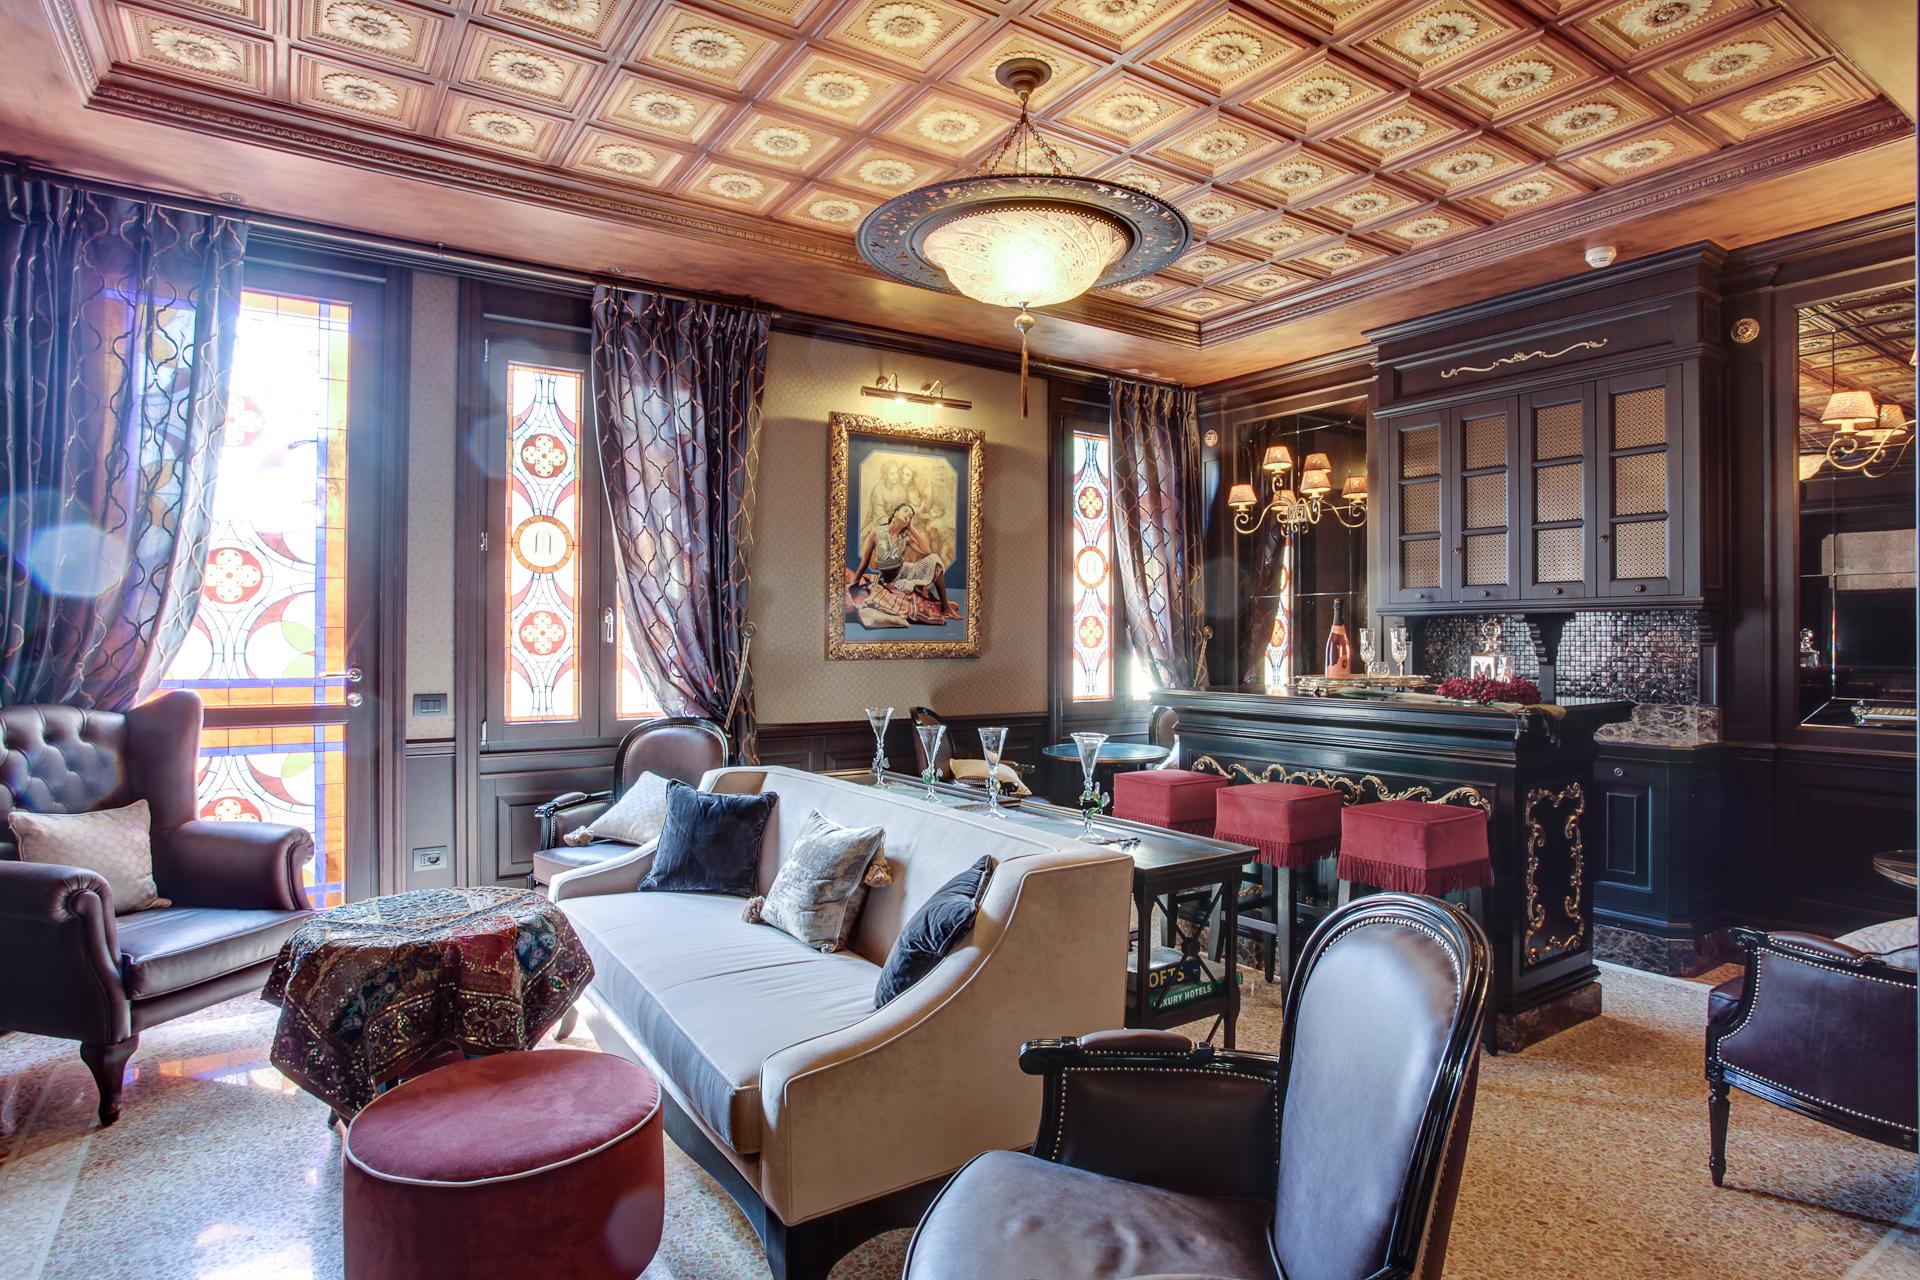 Vincitore categoria 4 stelle - Hotel Moresco